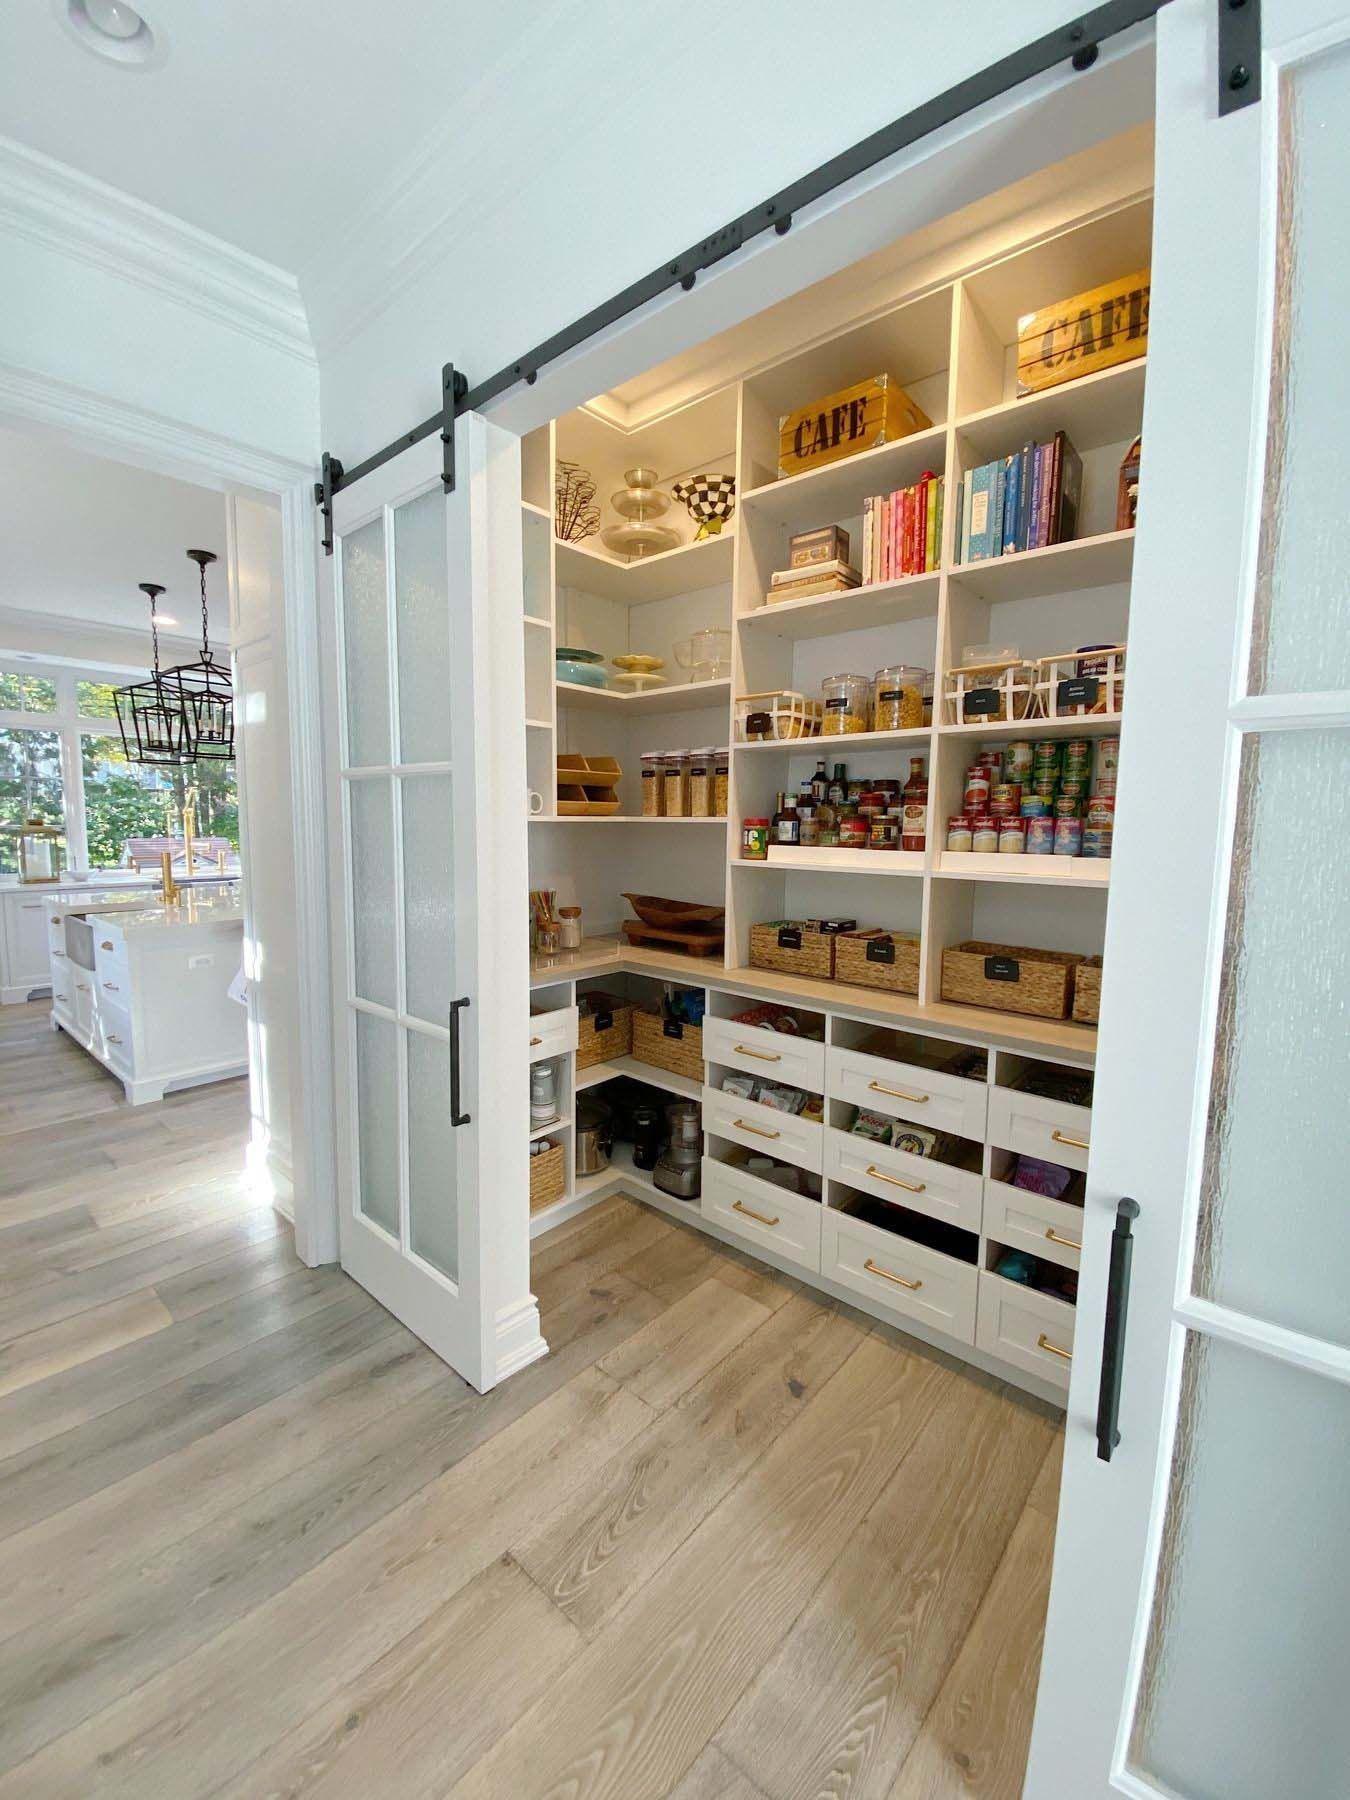 30 Brilliantly Organized Pantry Ideas To Maximize Your Storage